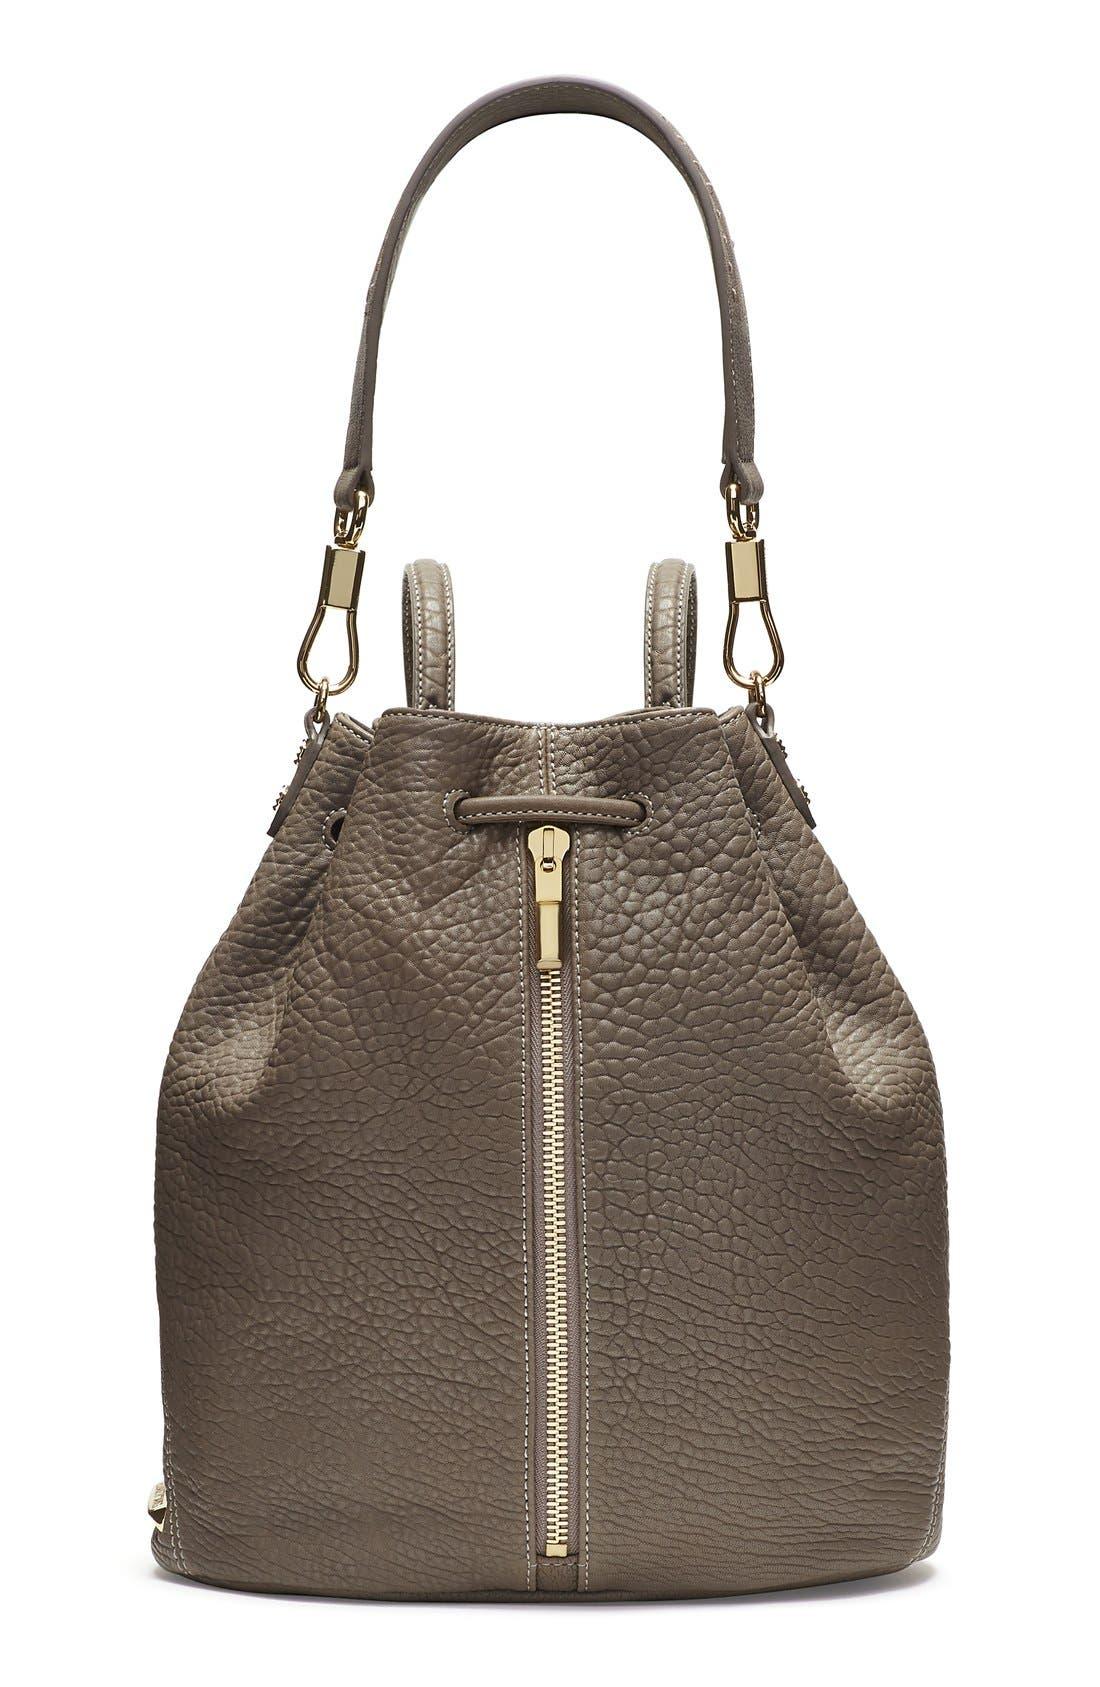 Alternate Image 1 Selected - Elizabeth and James 'Cynnie' Leather Sling Backpack